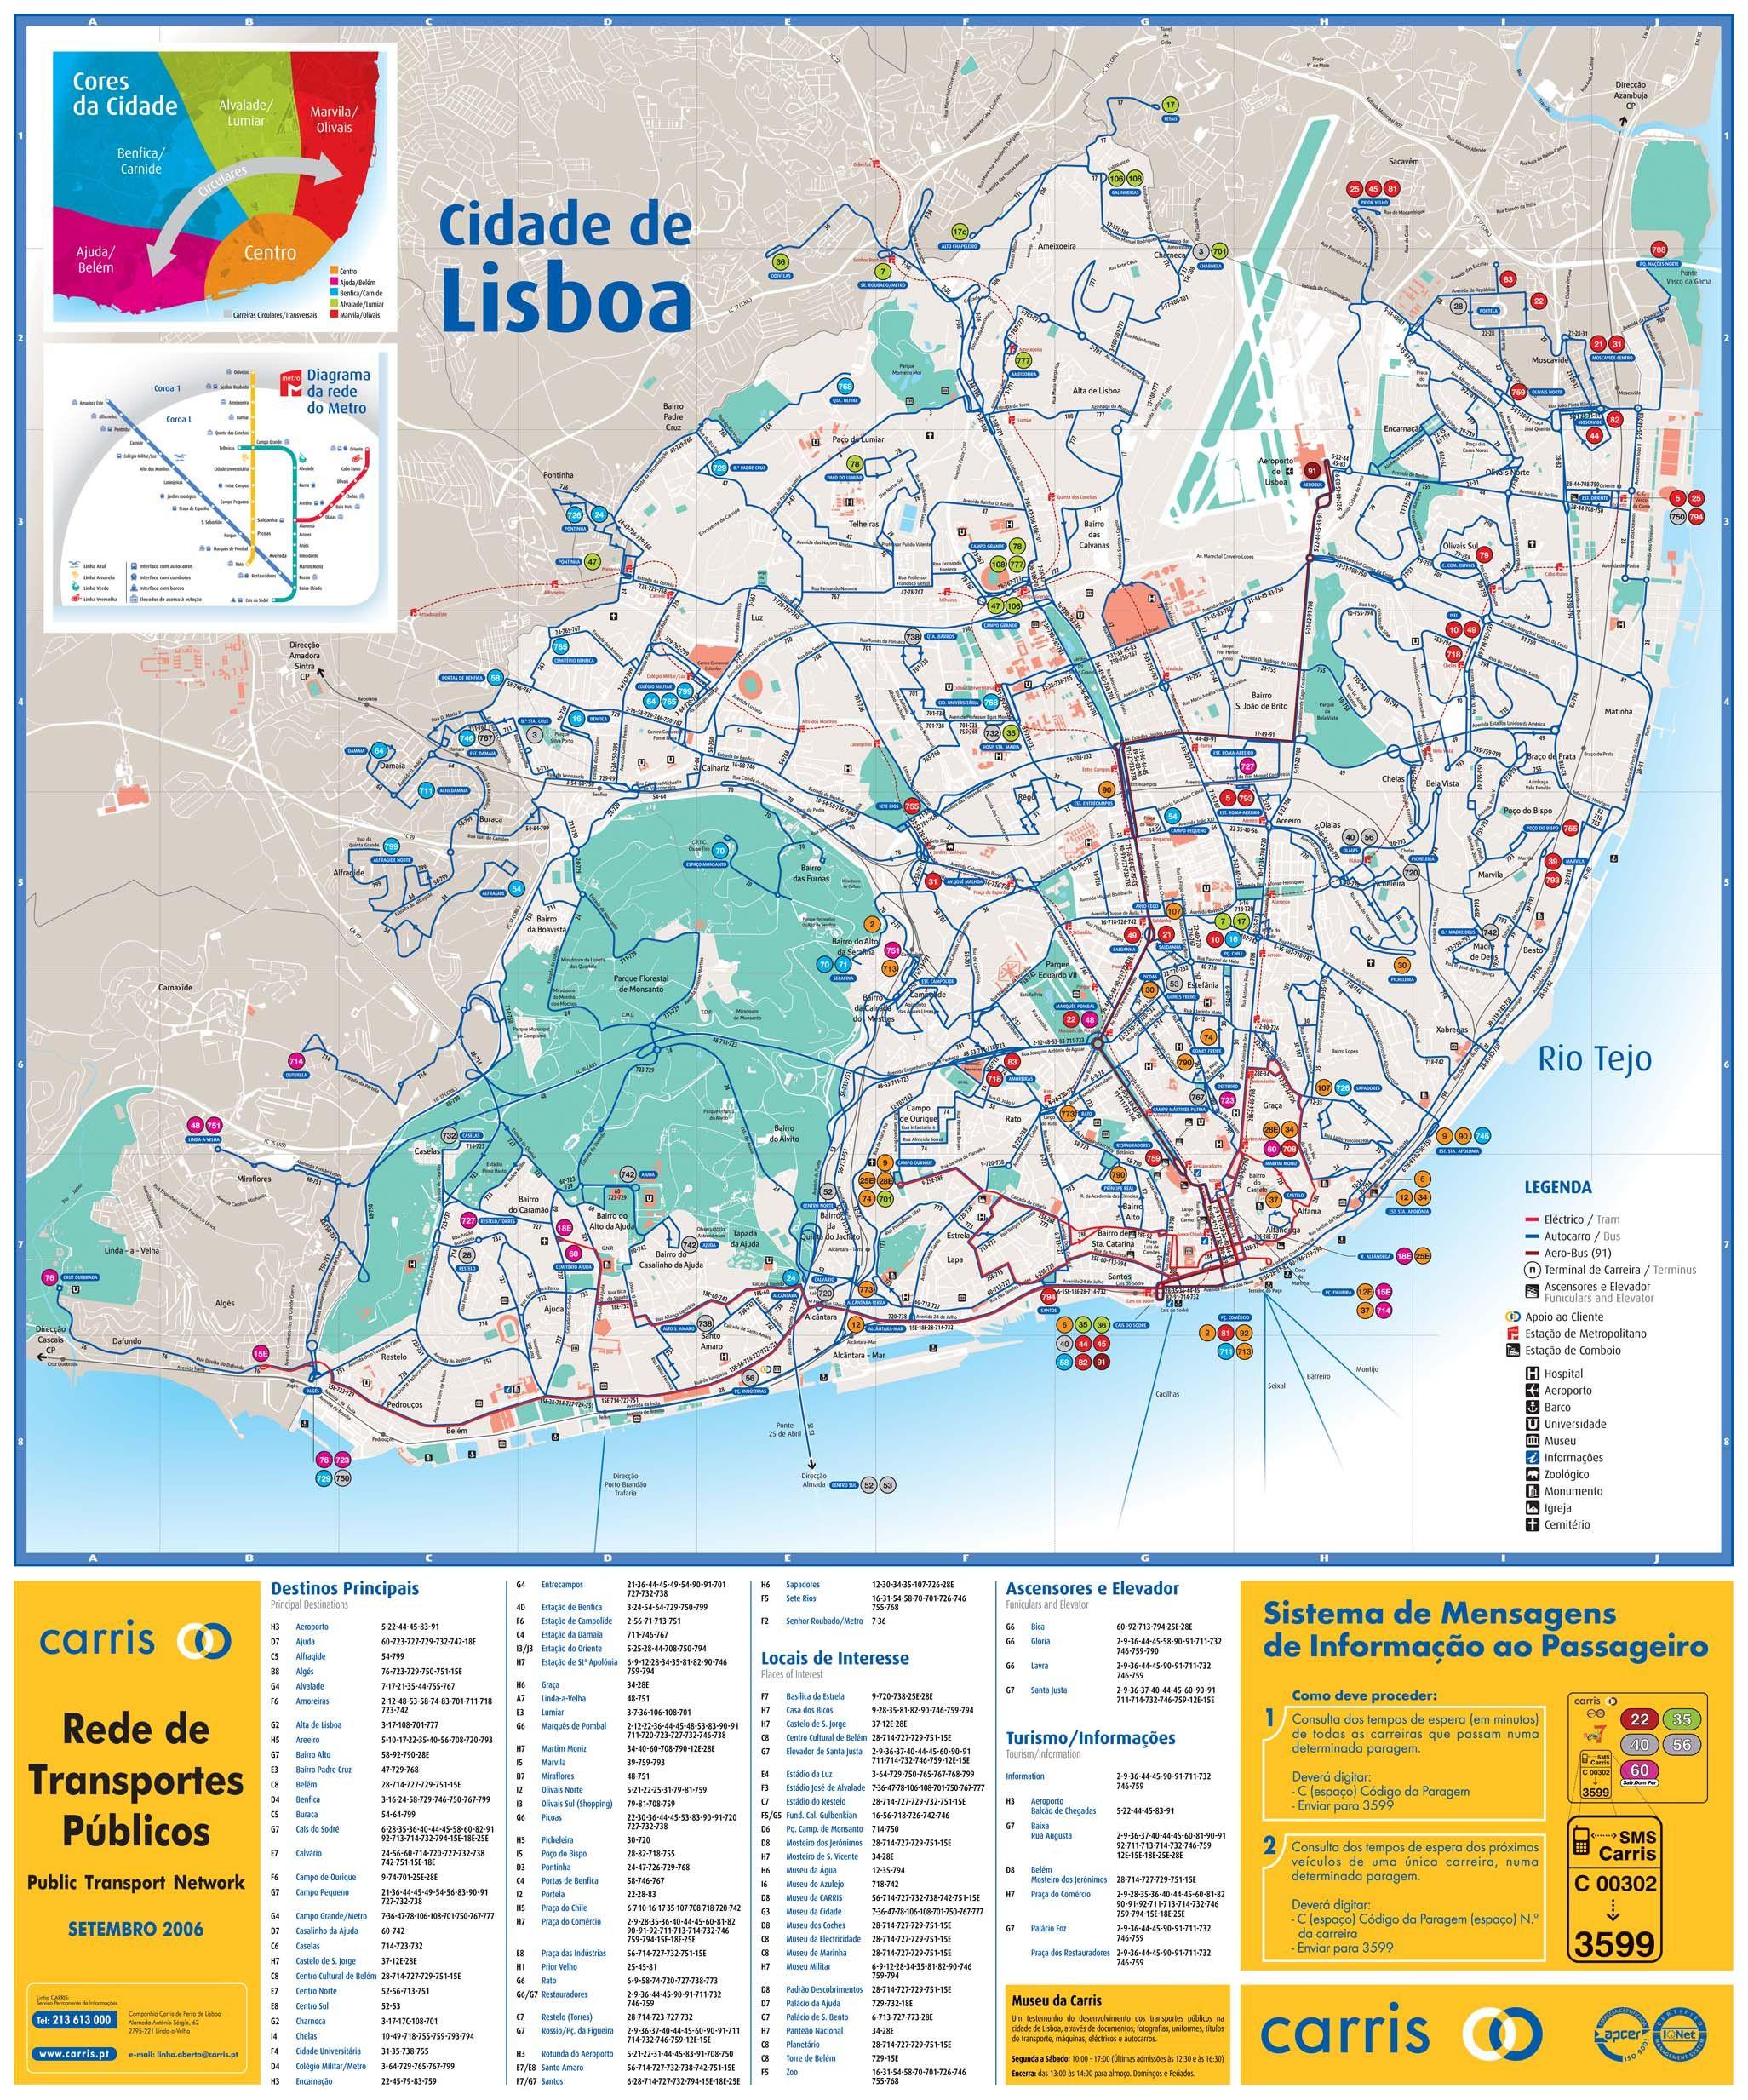 turismo lisboa mapa Mapa turístico de lisboa | Turismo en Portugal | Portugal  turismo lisboa mapa